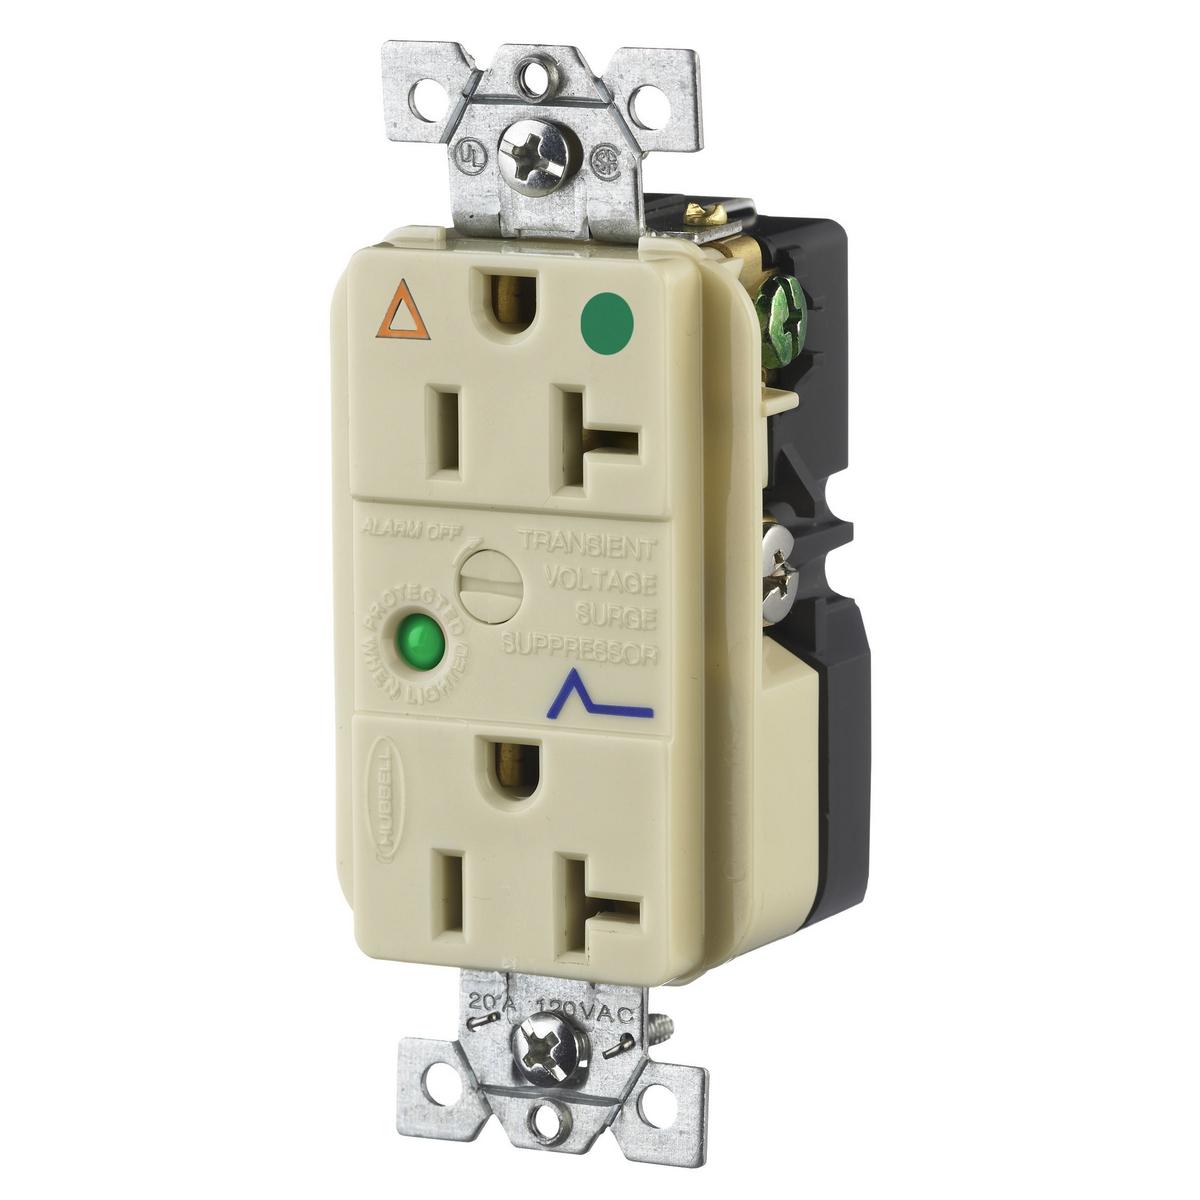 Hubbell IG8362ISA 20 Amp 125 Volt 2-Pole 3-Wire NEMA 5-20R Ivory Duplex Surge Suppression Receptacle